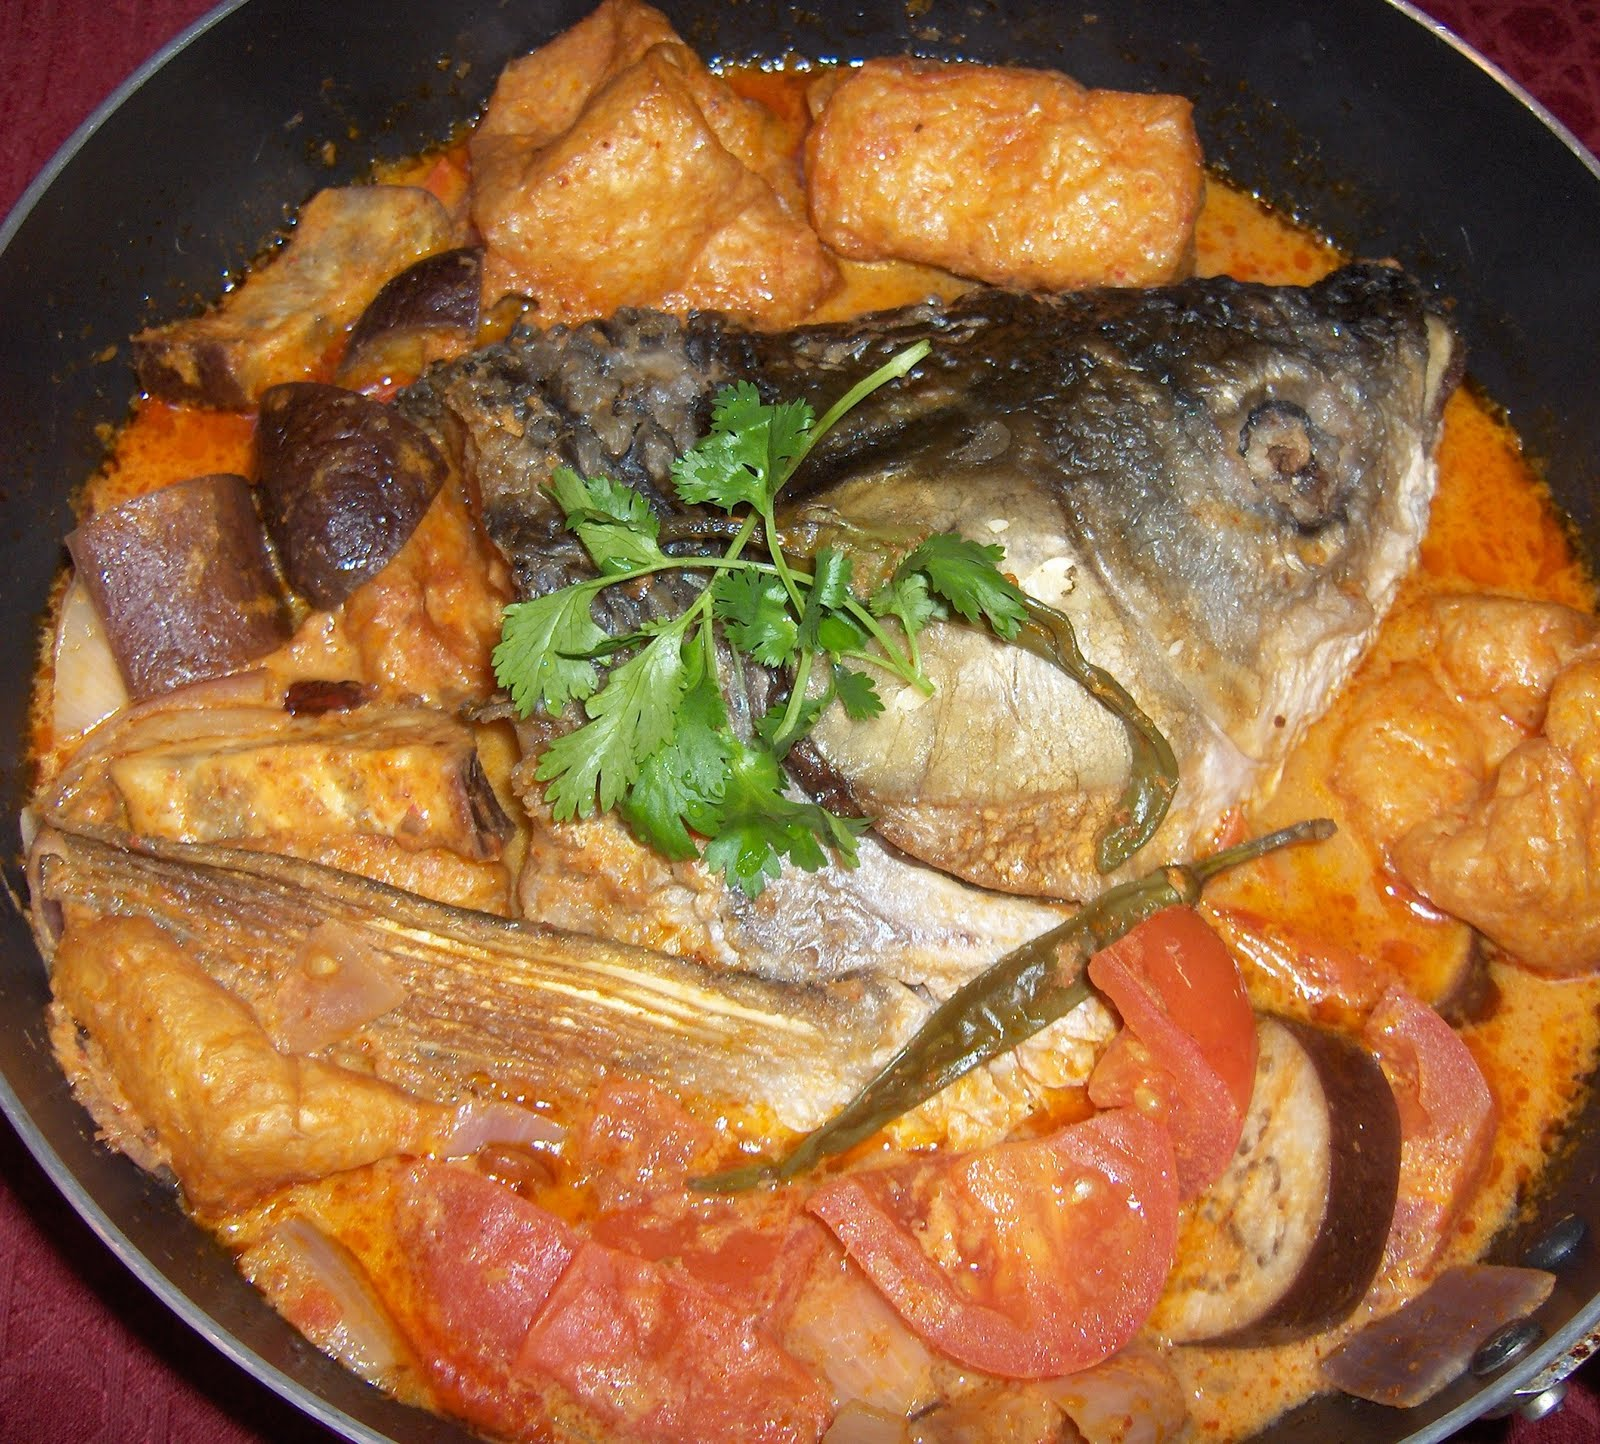 http://3.bp.blogspot.com/-vYL-wfFkExc/TazIZmcWwFI/AAAAAAAAPtE/Ve3E35SEHLs/s1600/curry%2Bfish%2Bhead%2B2.jpg